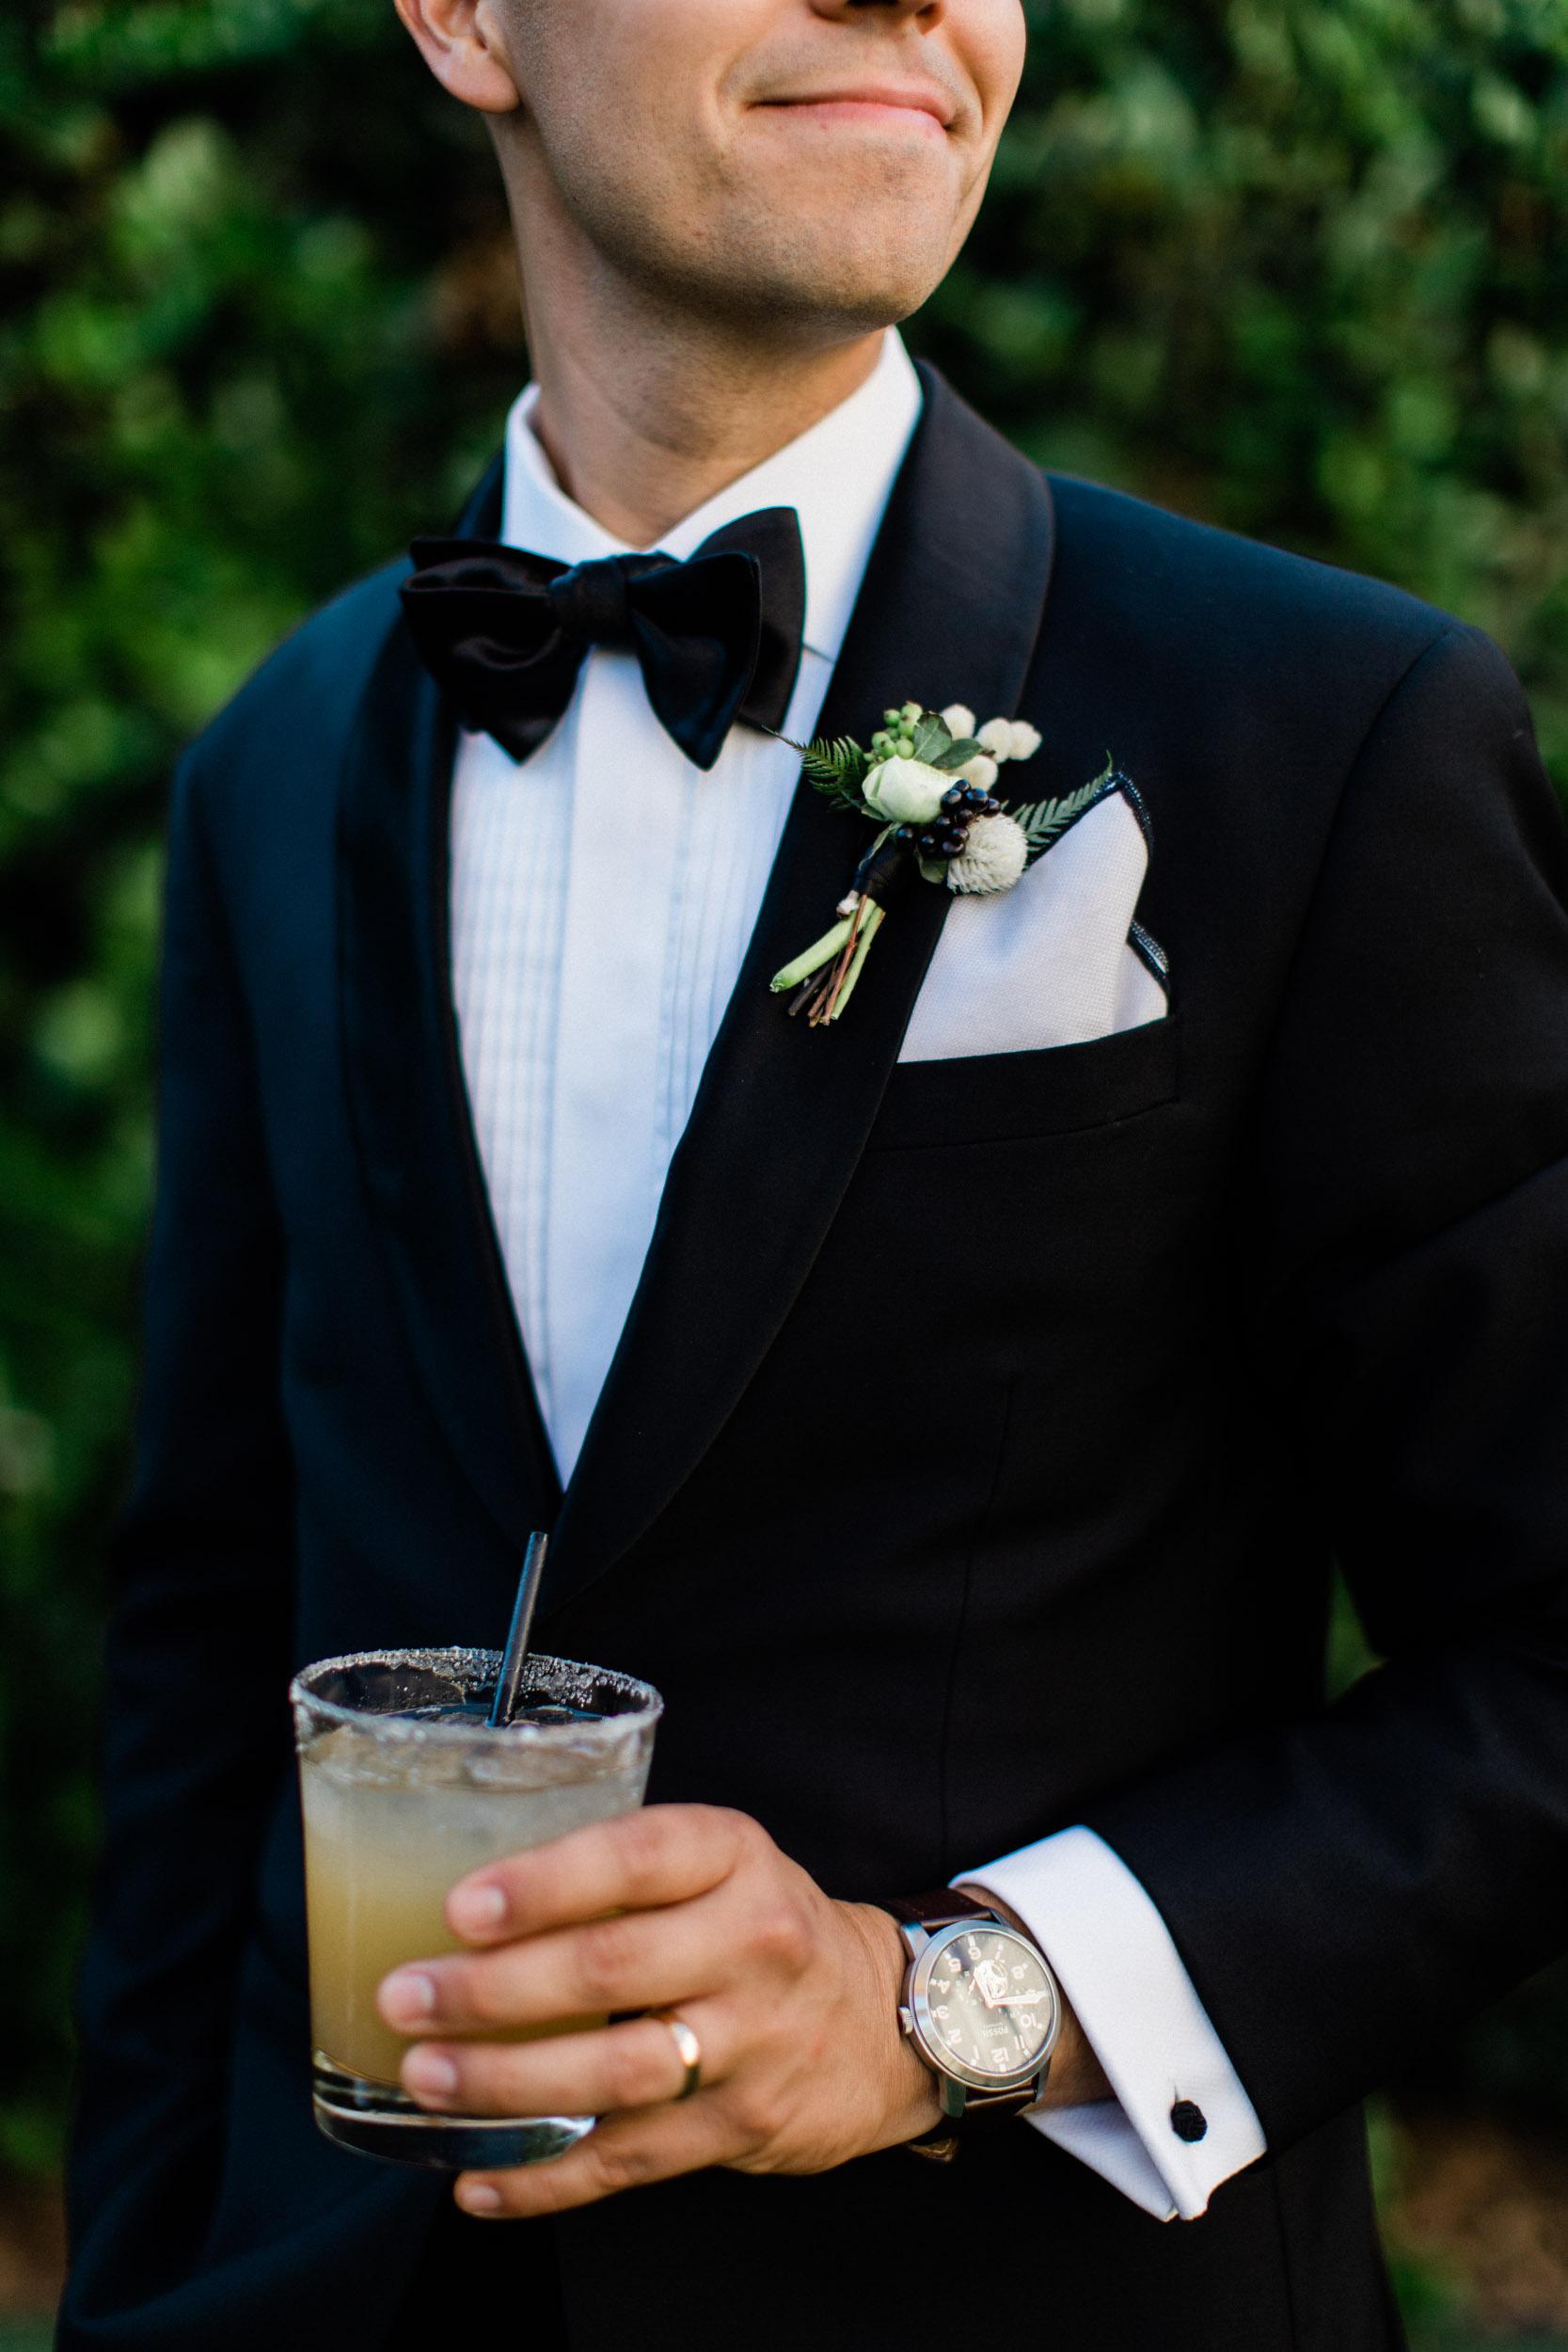 BKM-Photography-Los-Angeles-Highland-Park-York-Manor-Wedding-Photography-0821.jpg